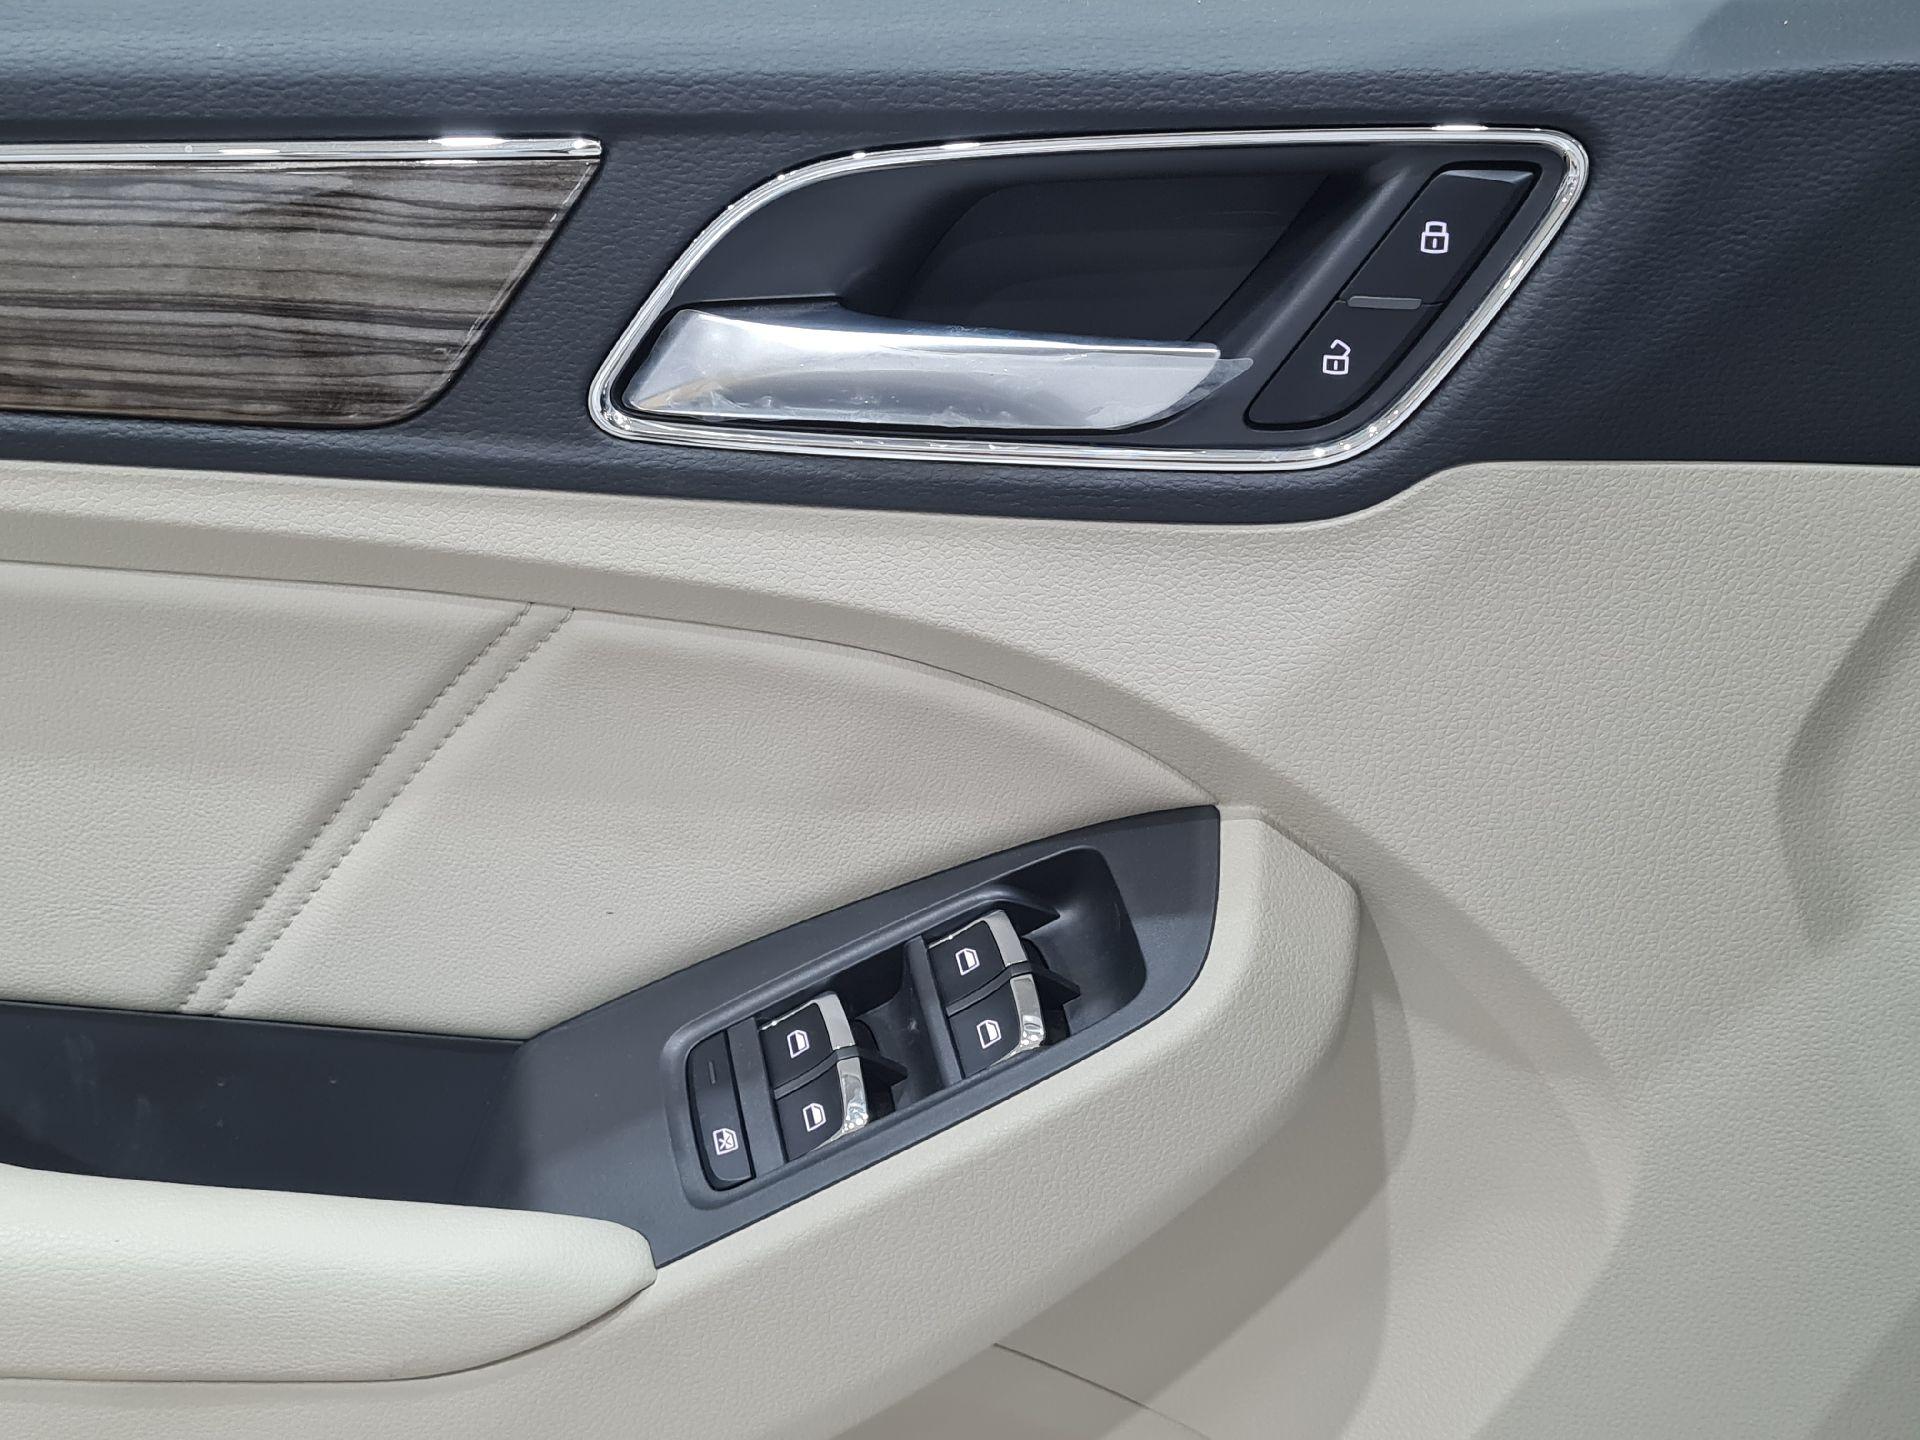 MG RX5 LUX 2020 فل سعودي للبيع في الرياض - السعودية - صورة كبيرة - 10